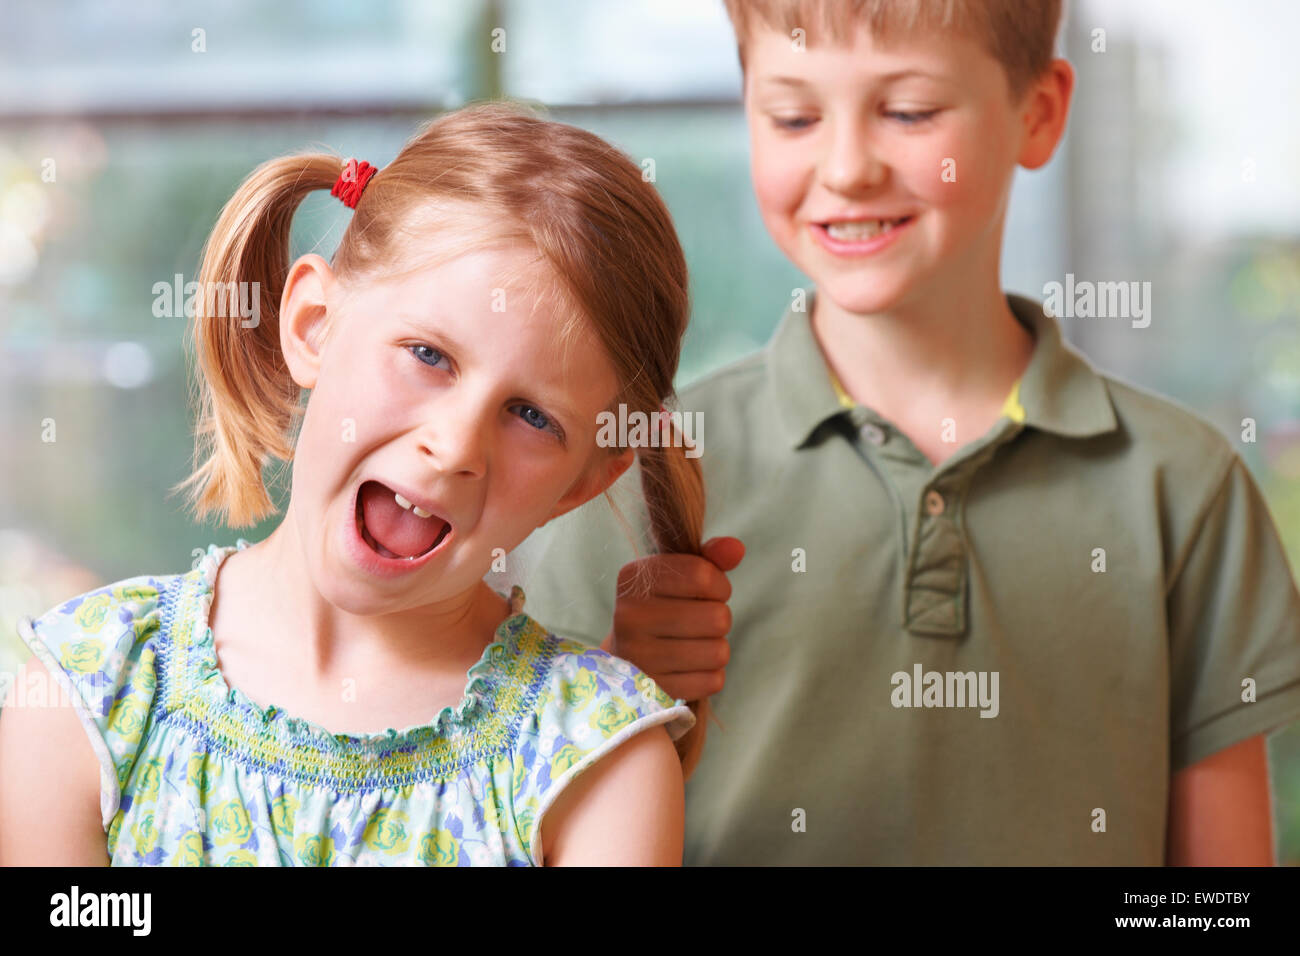 Boy Bullying Girl By Pulling Hair Stock Photo